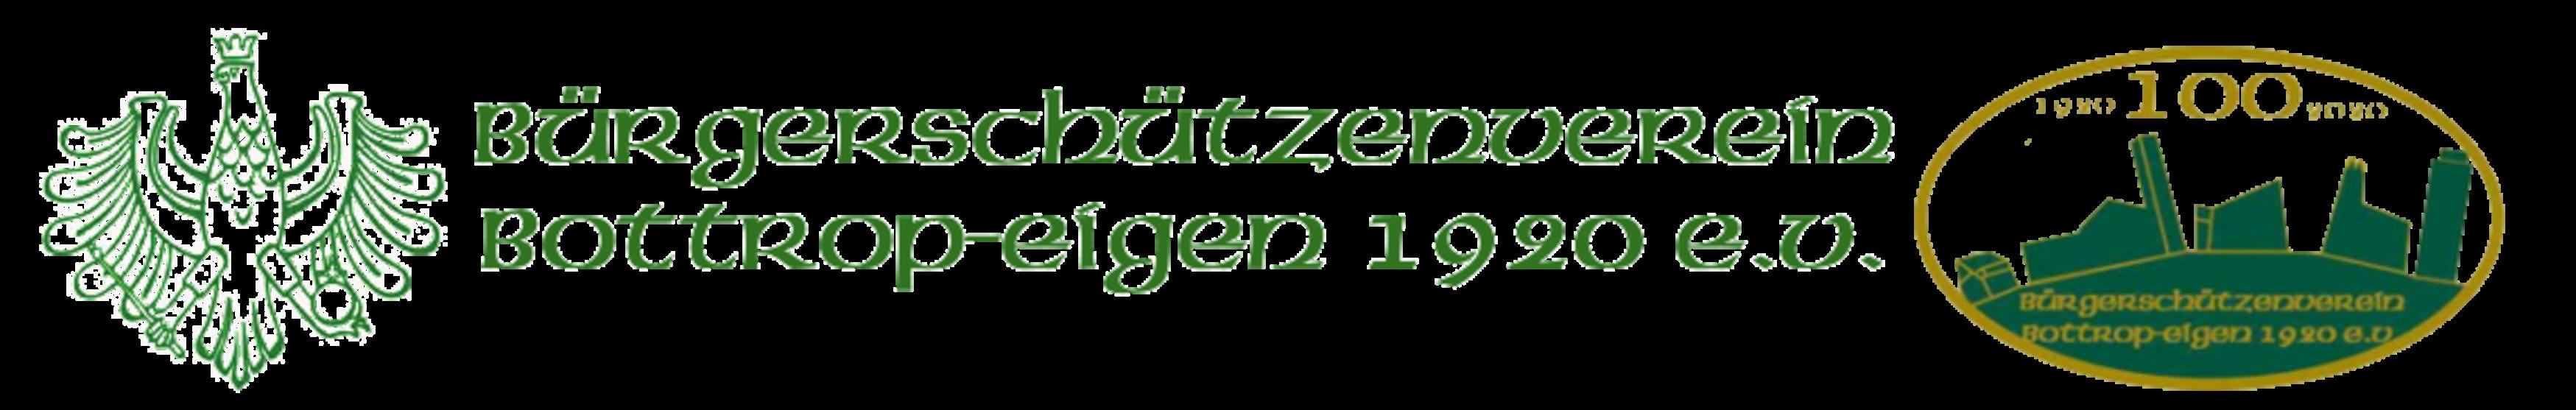 Bürgerschtzenverein Bottrop Eigen